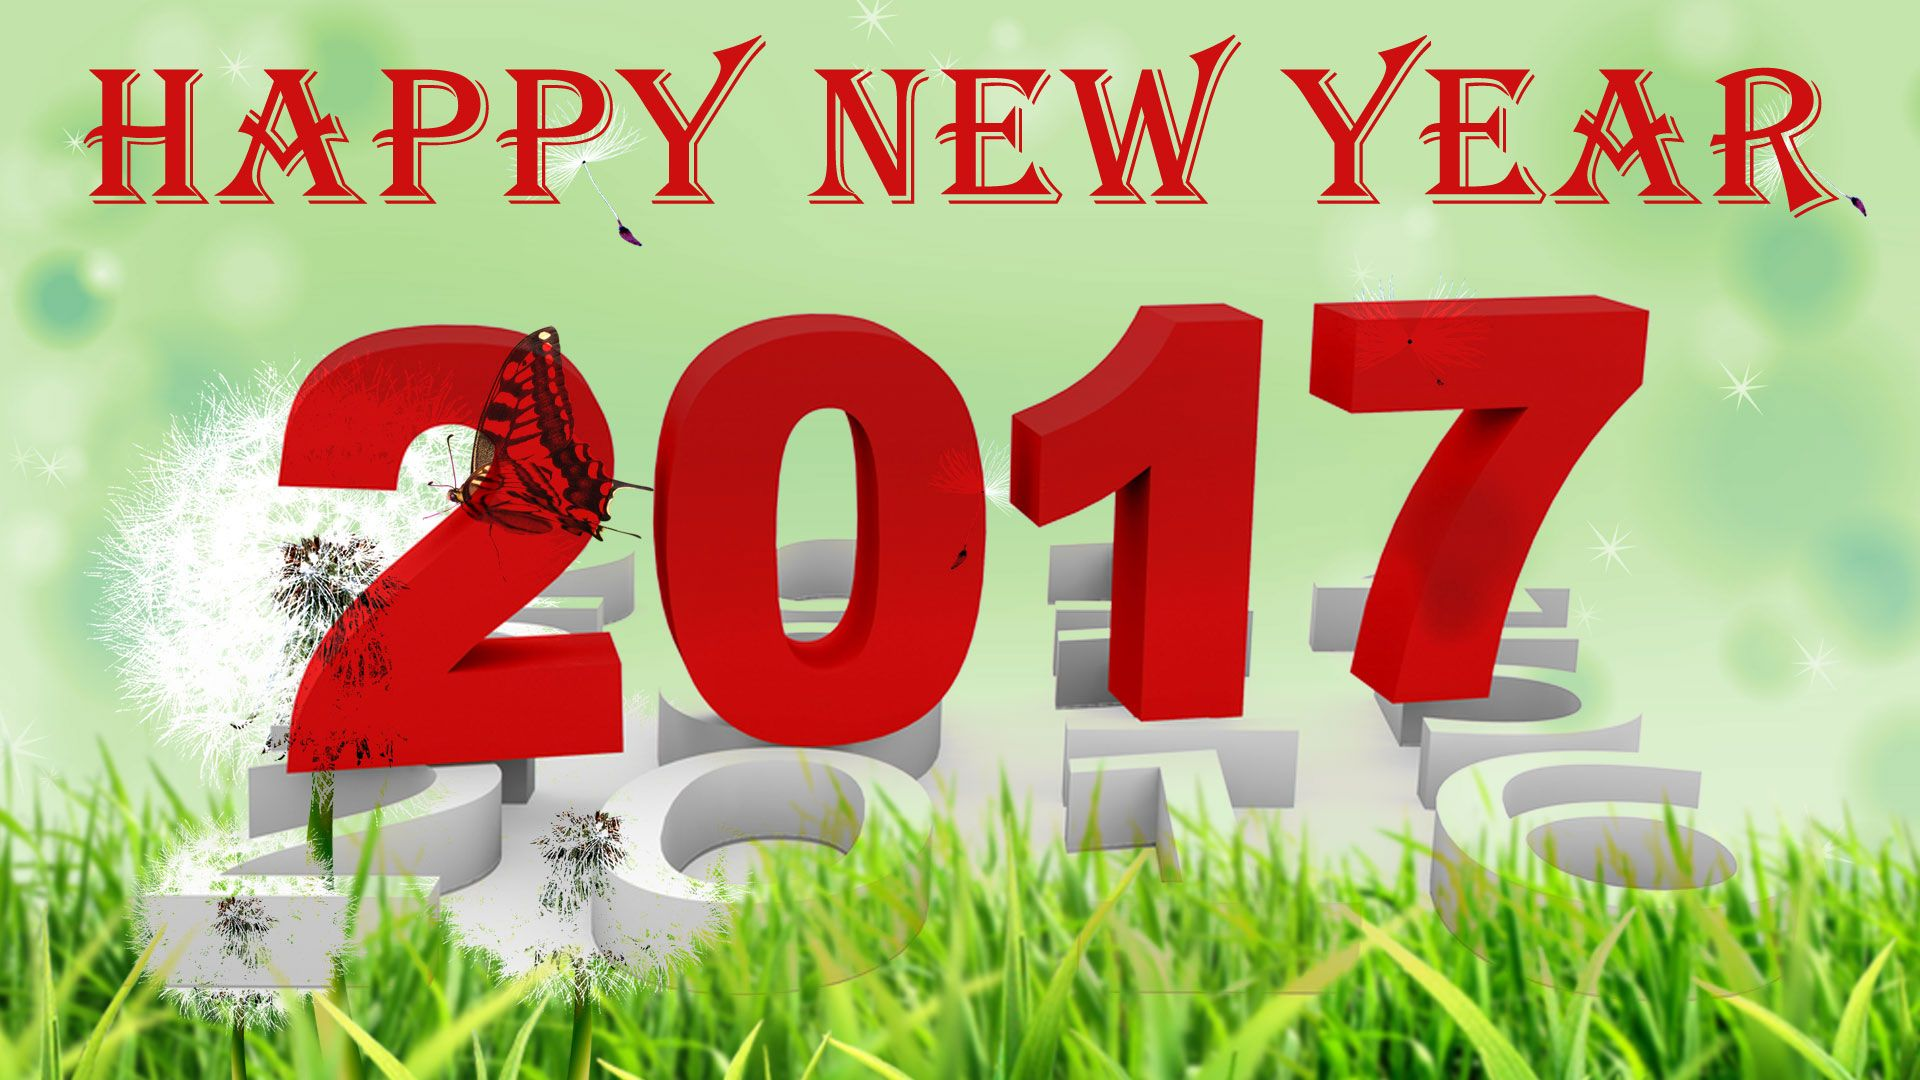 Happy New Year 2018 Image